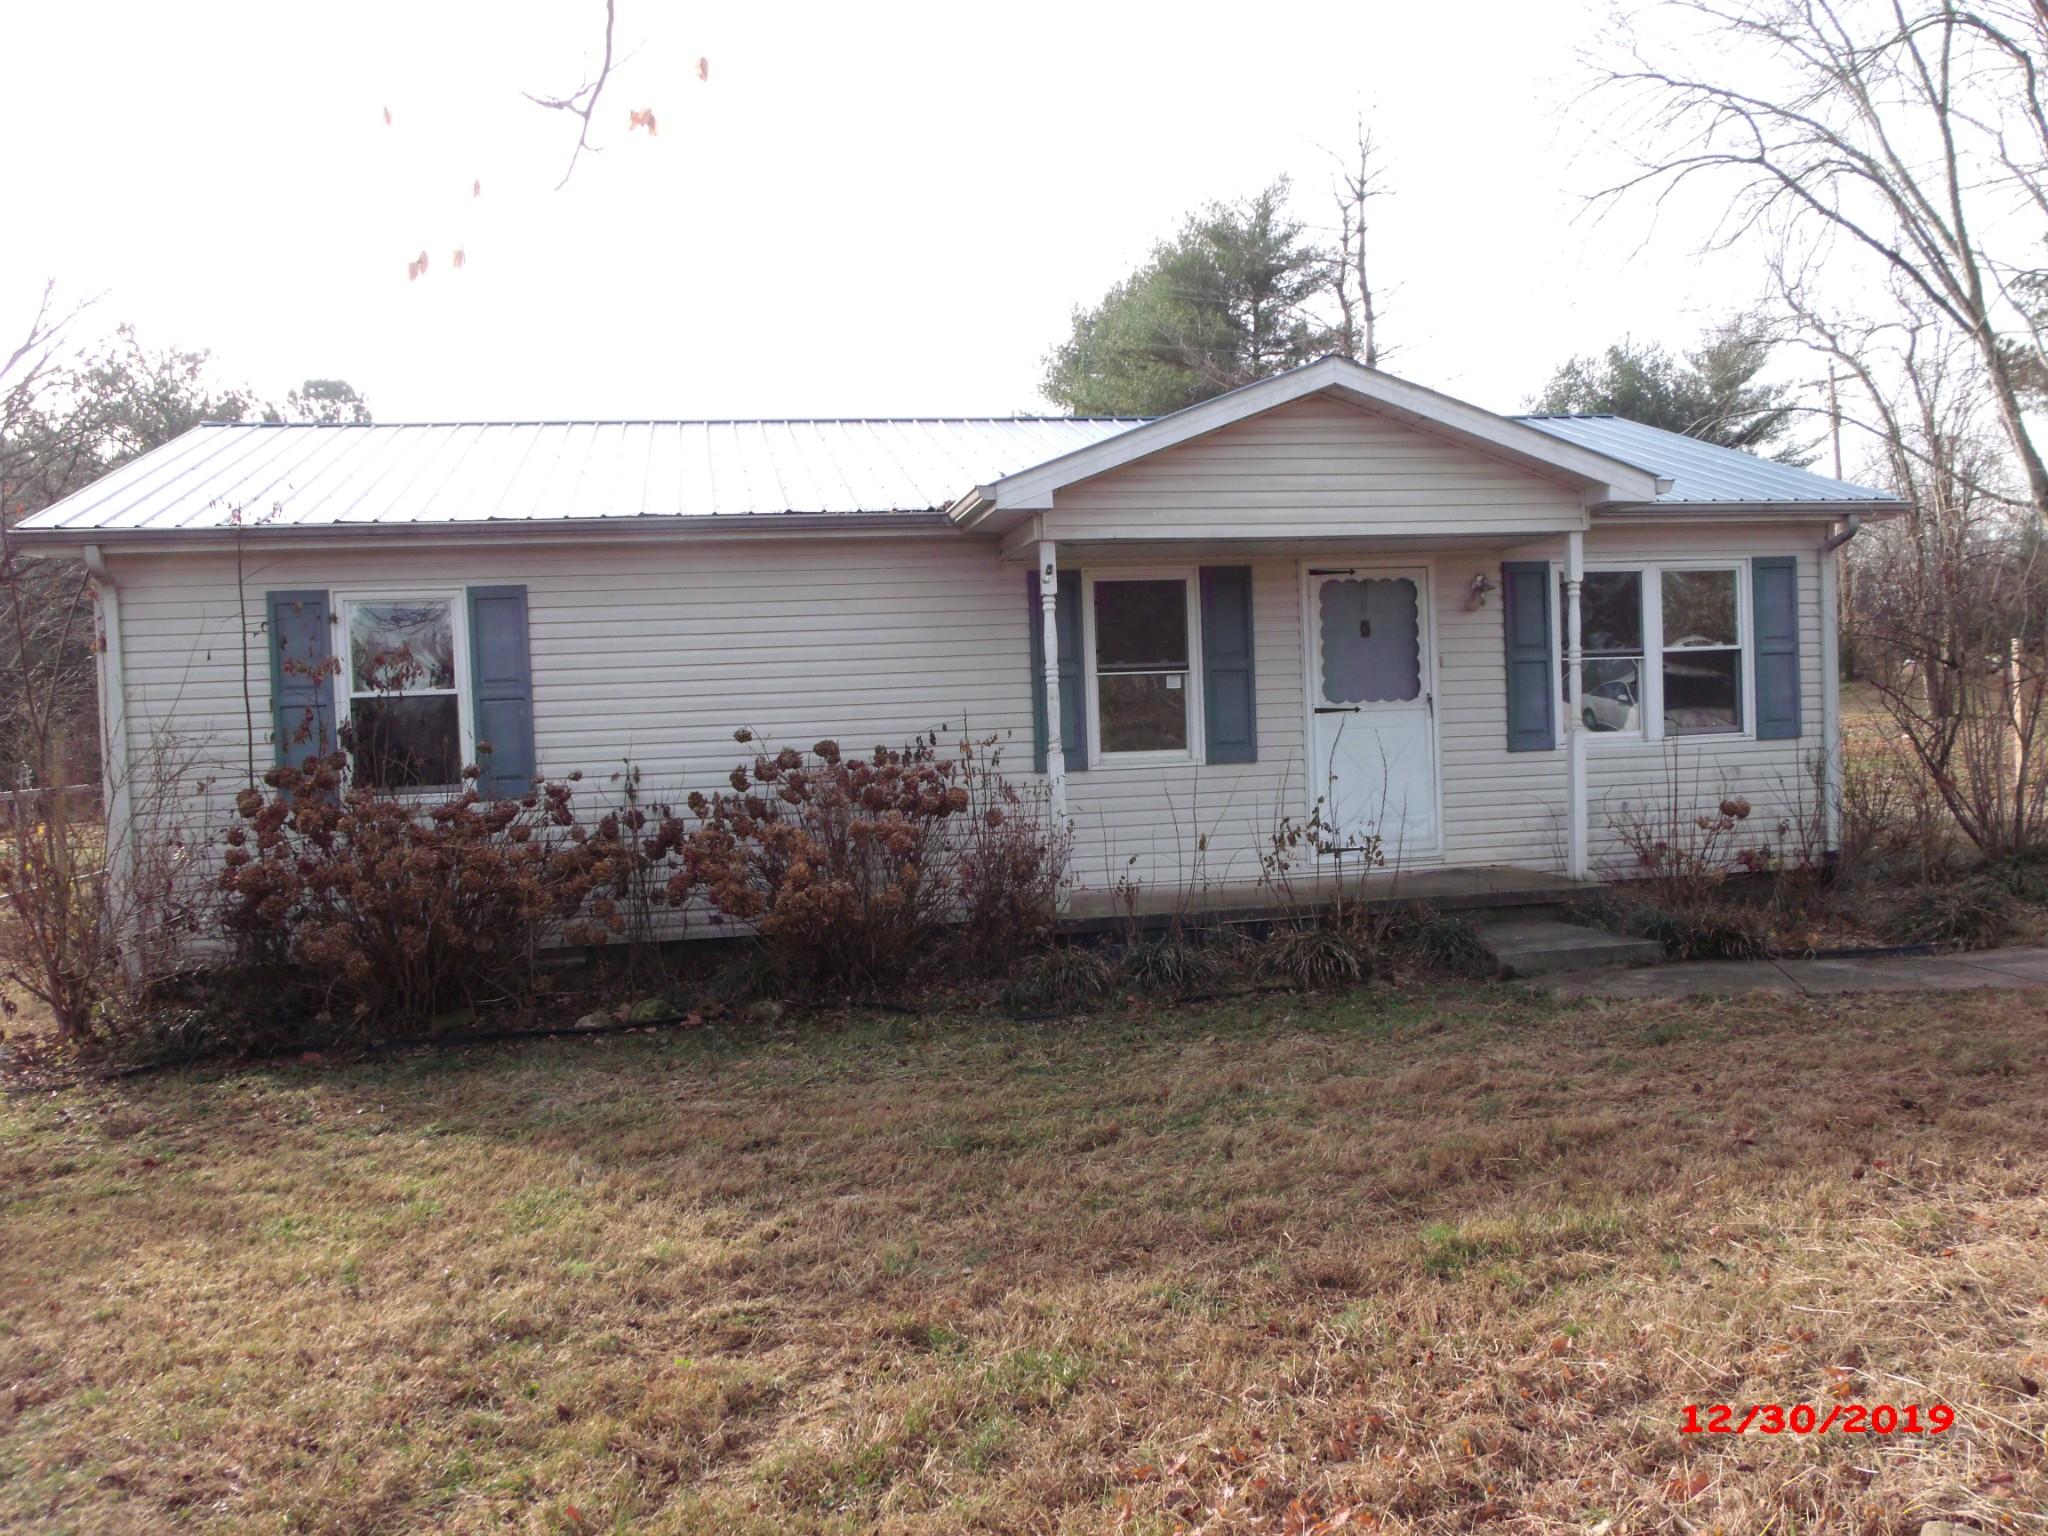 1665 Pleasant Ridge Rd, Huntland, TN 37345 - Huntland, TN real estate listing